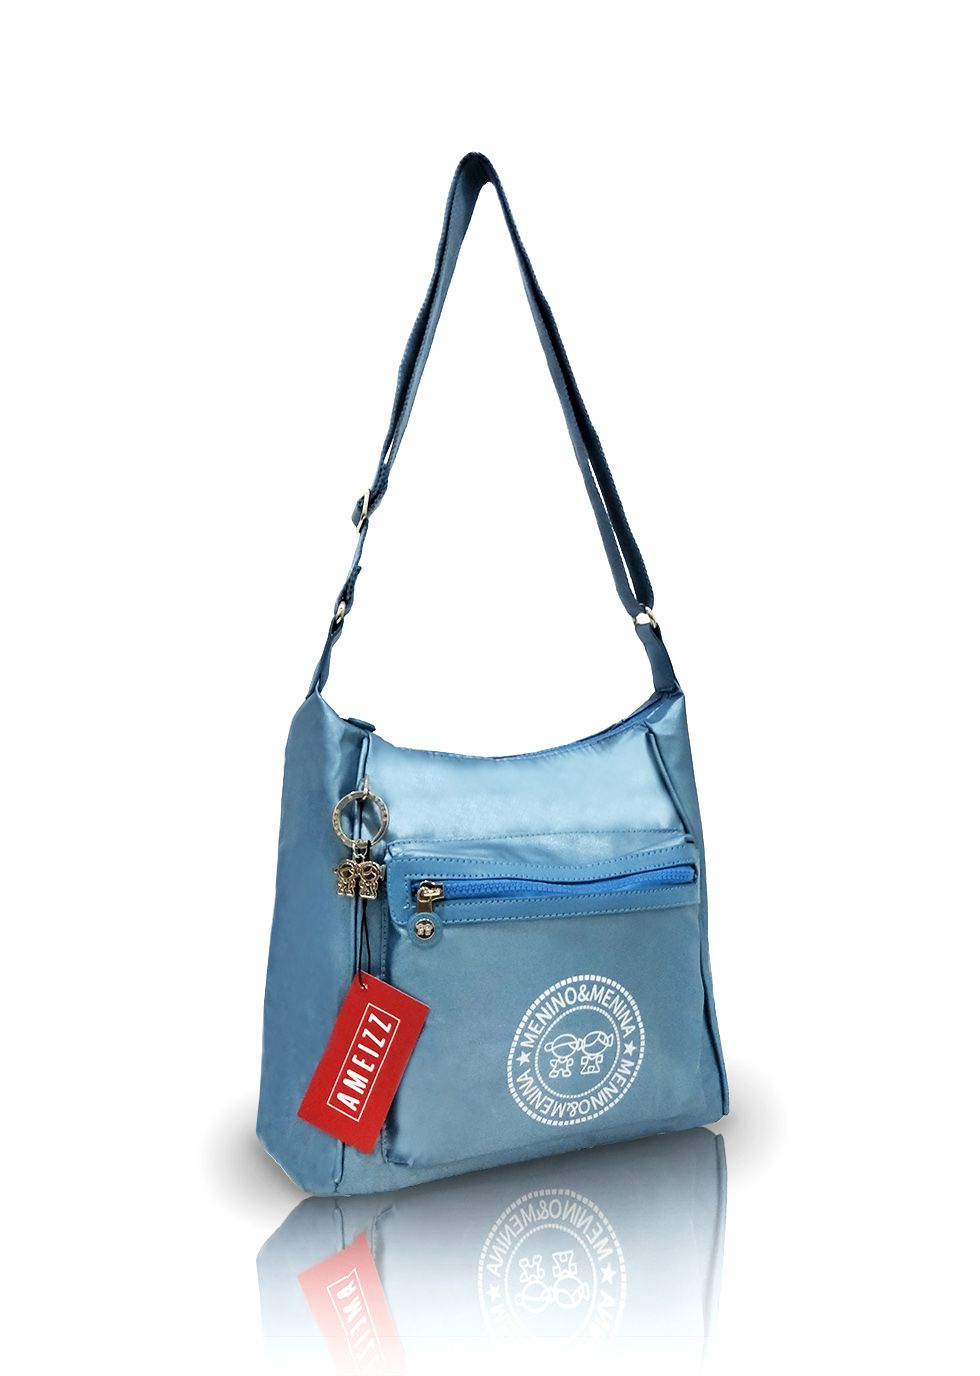 Bolsa Juvenil Feminina Transversal Metalizada Azul Fashion